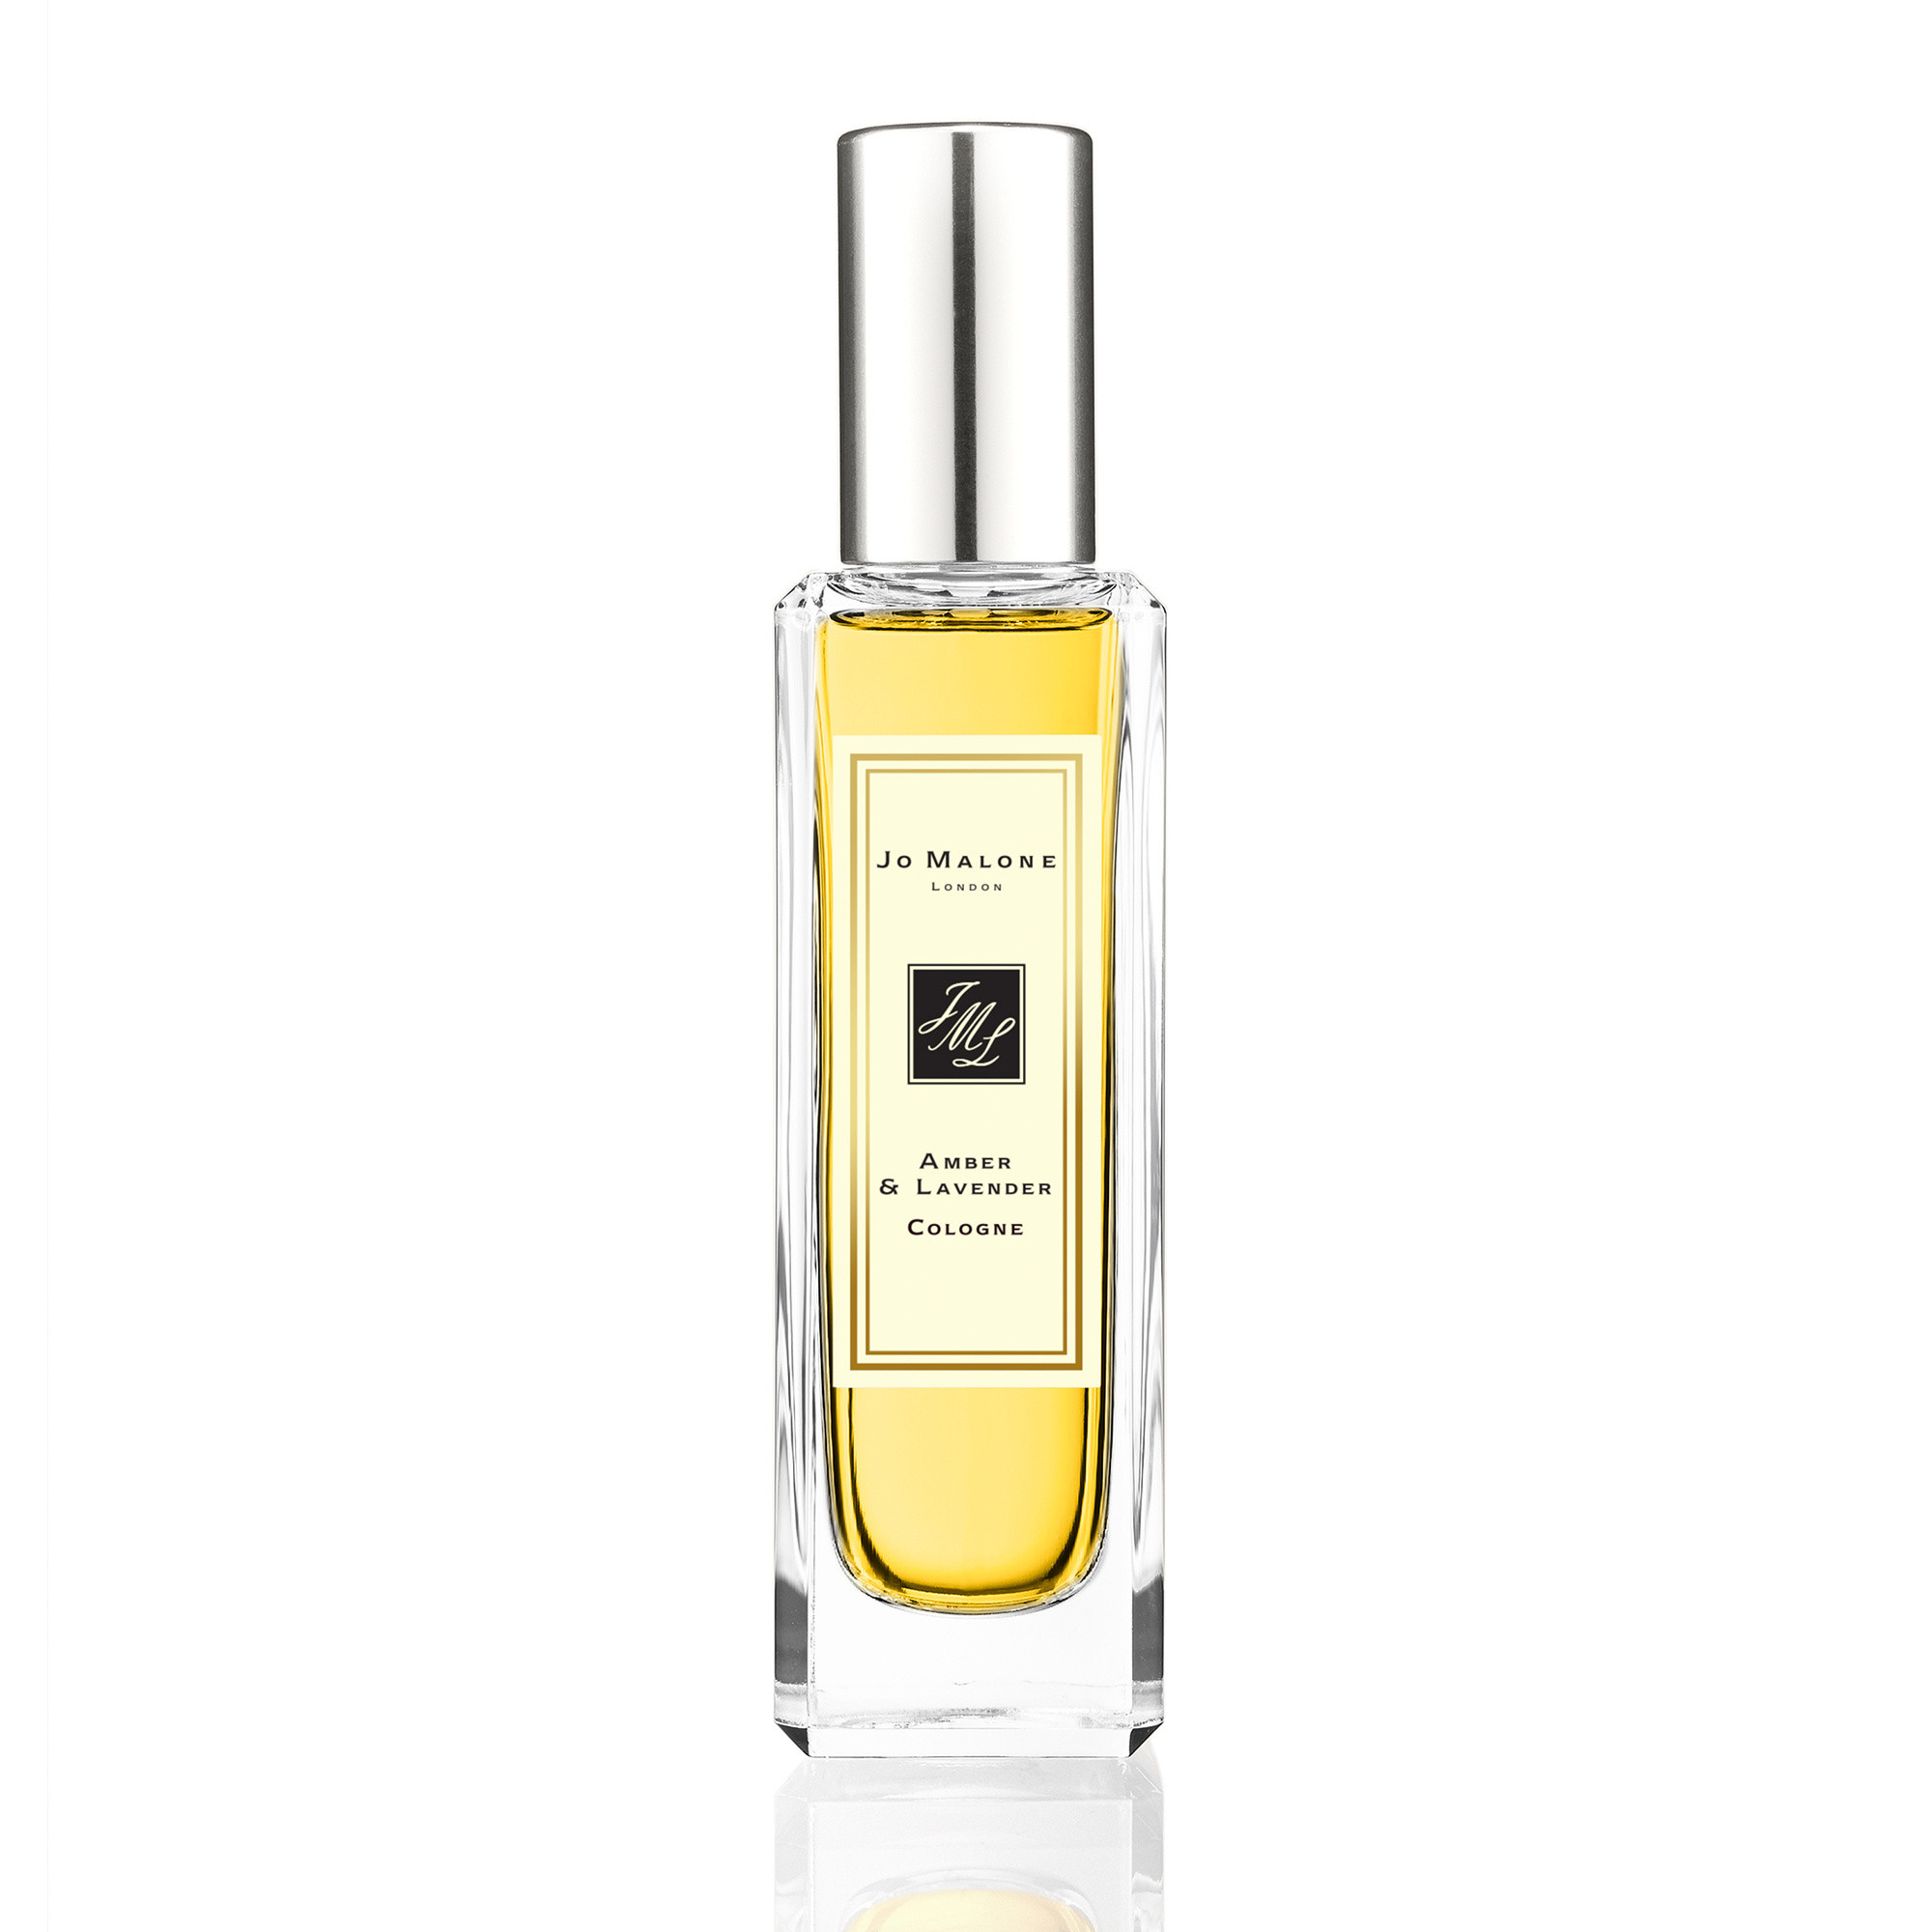 Jo Malone London amber & lavender cologne 30 ml, Beige, large image number 0